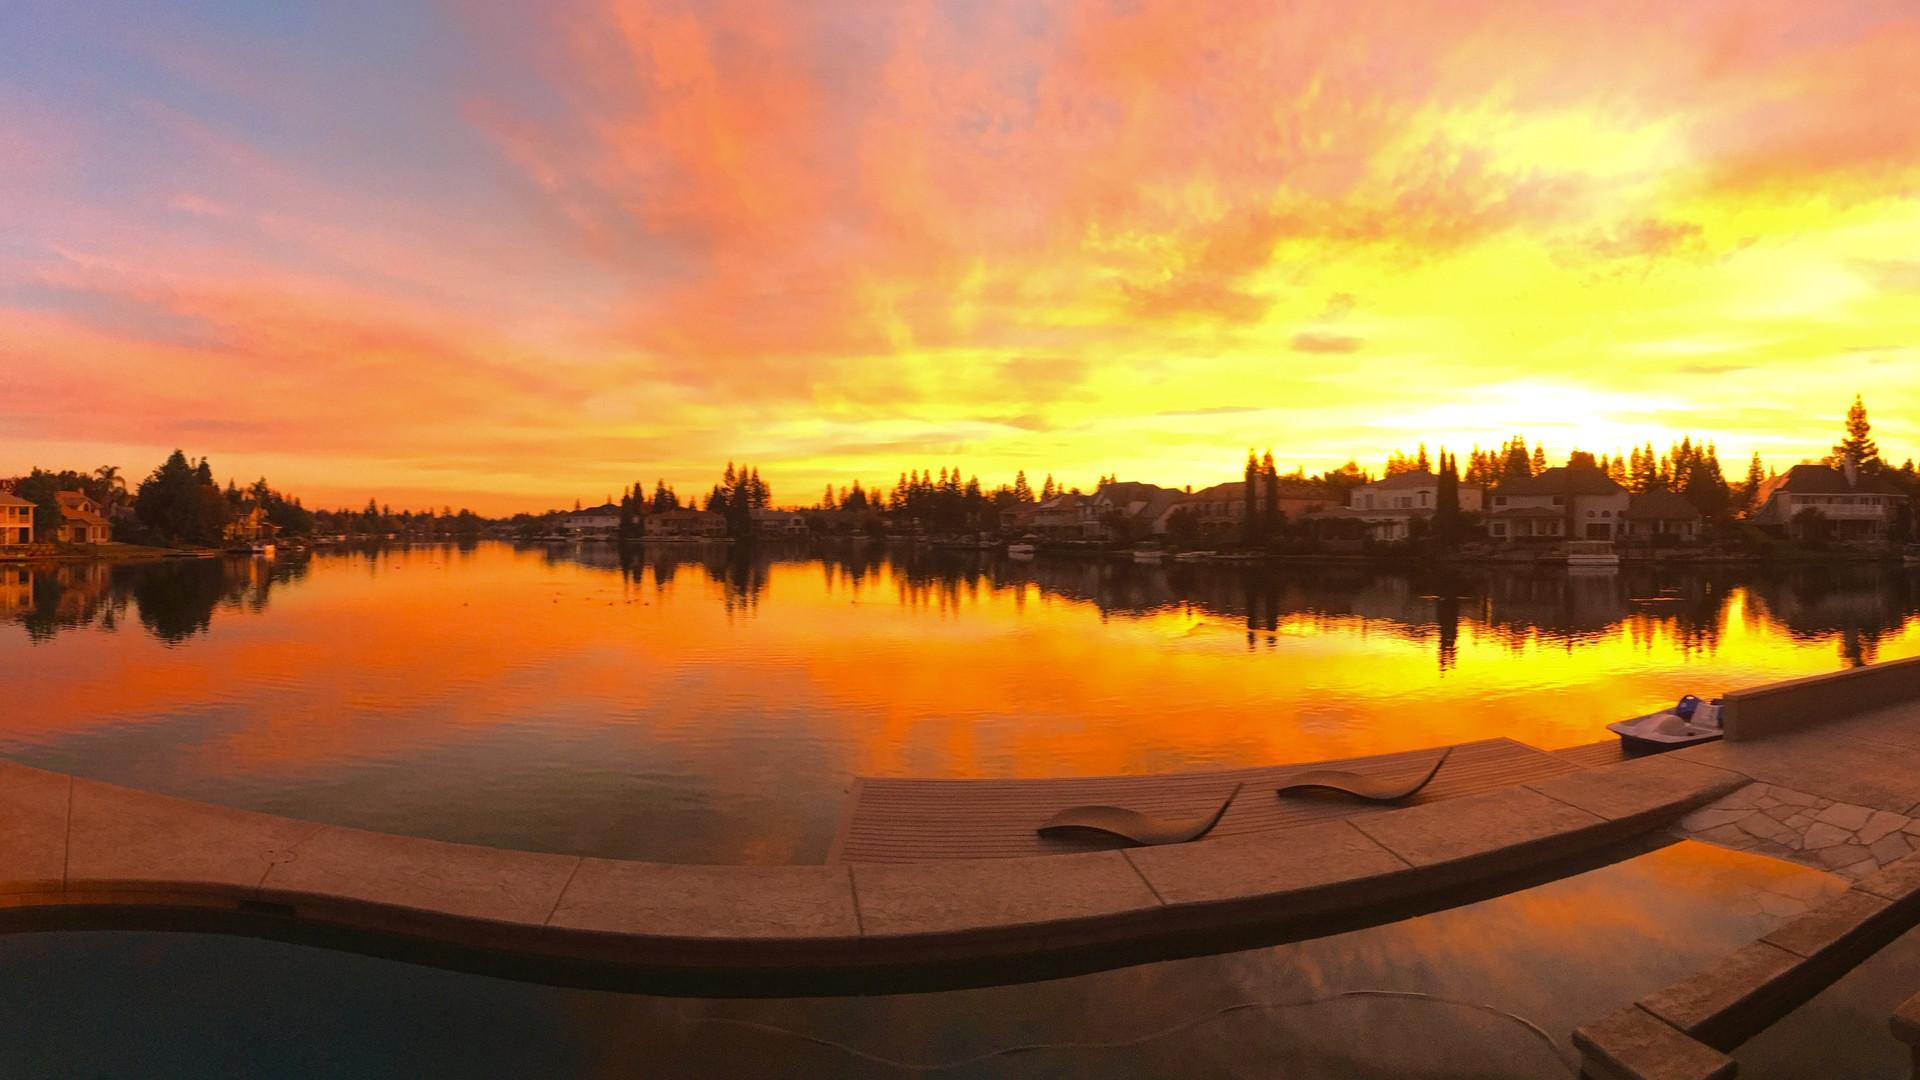 woodward lake.jpg